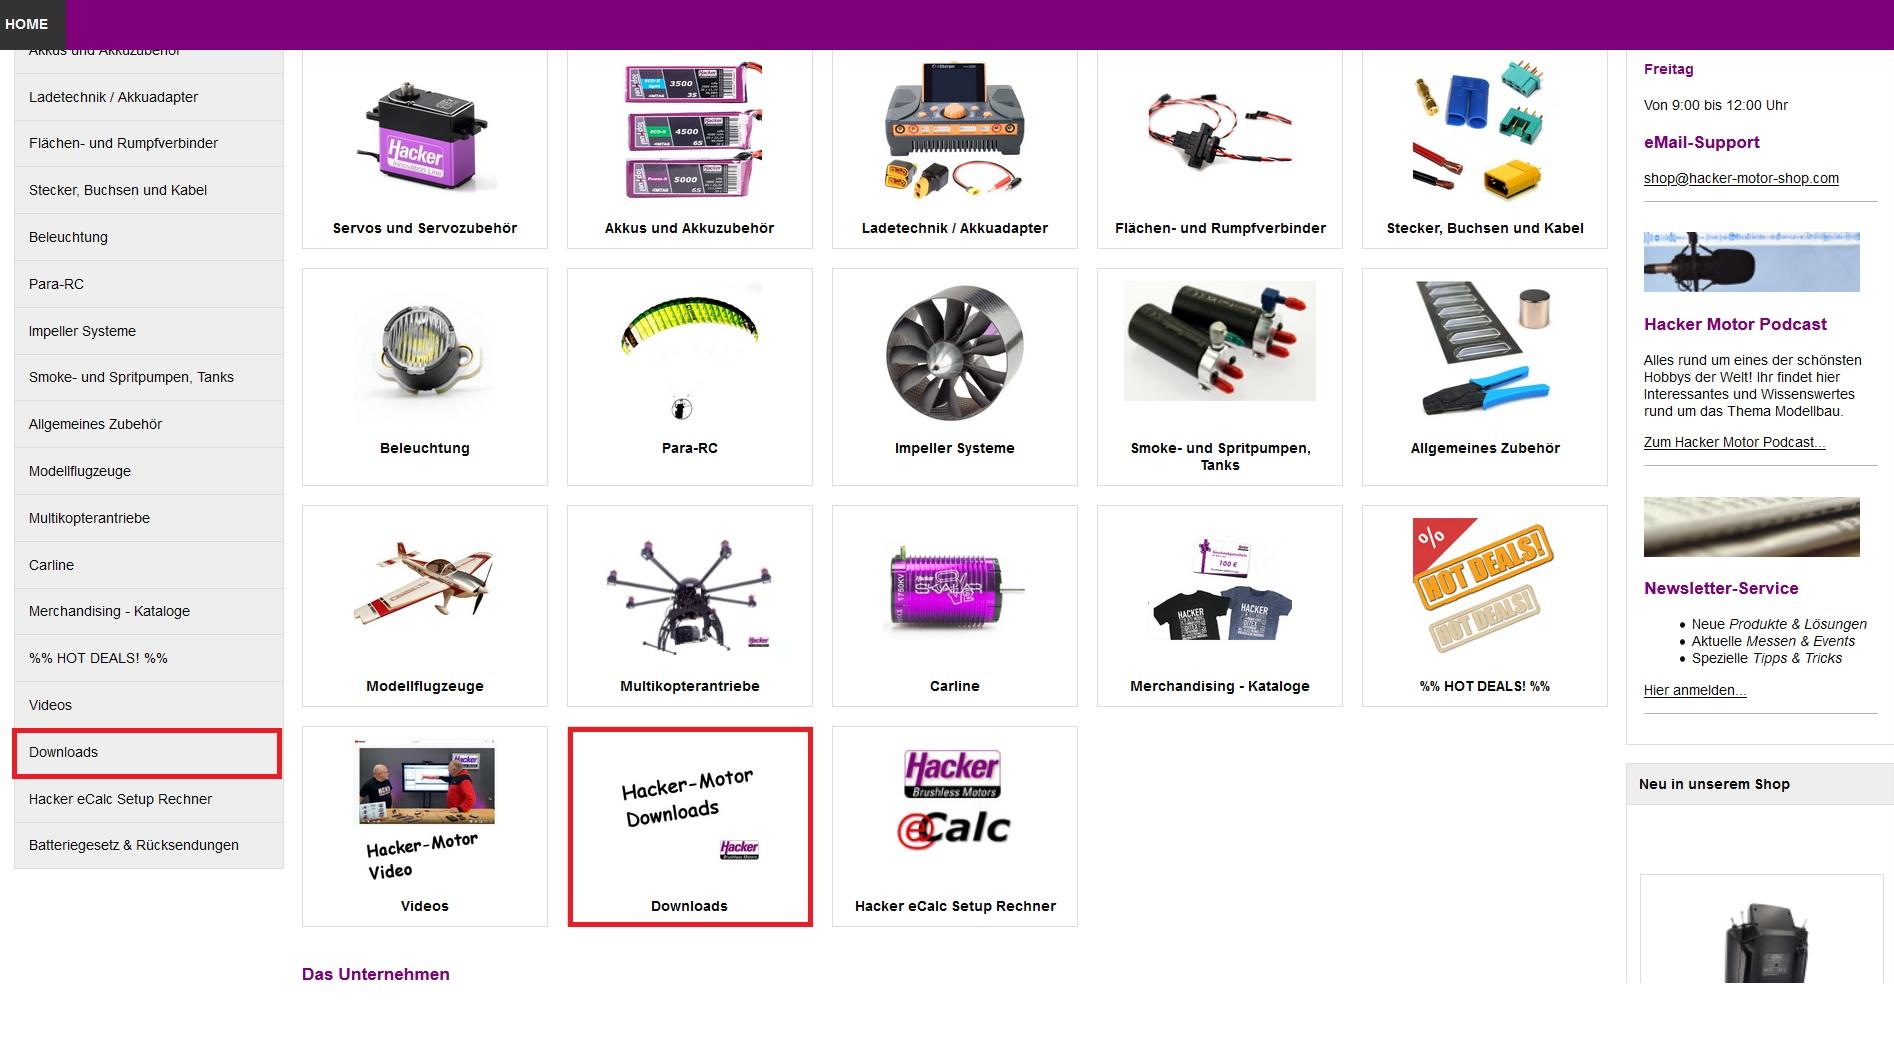 shop_download_jeti_1.jpg